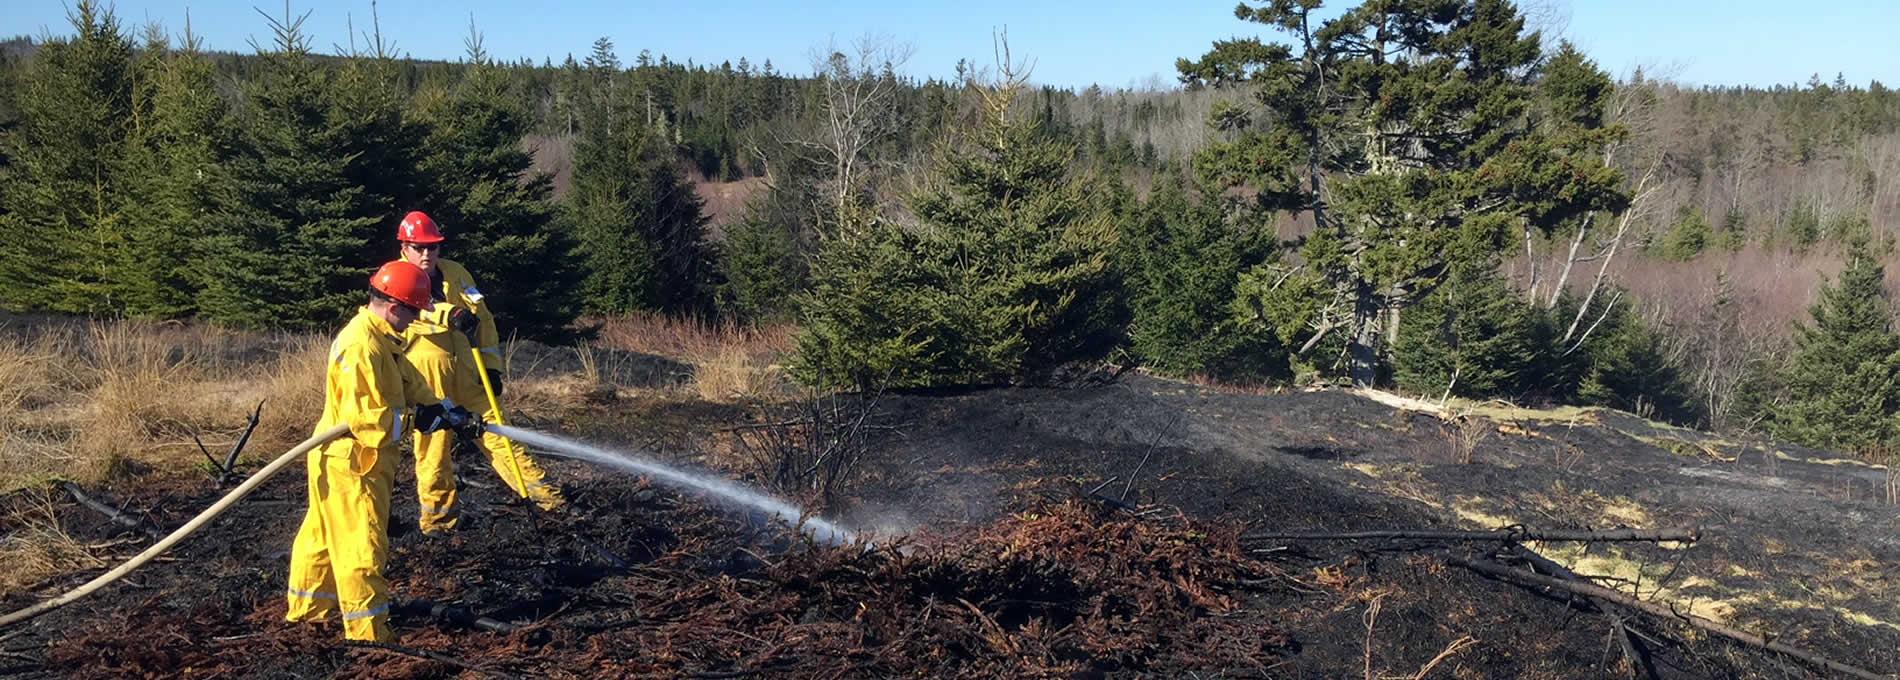 ldfd-forest-fire